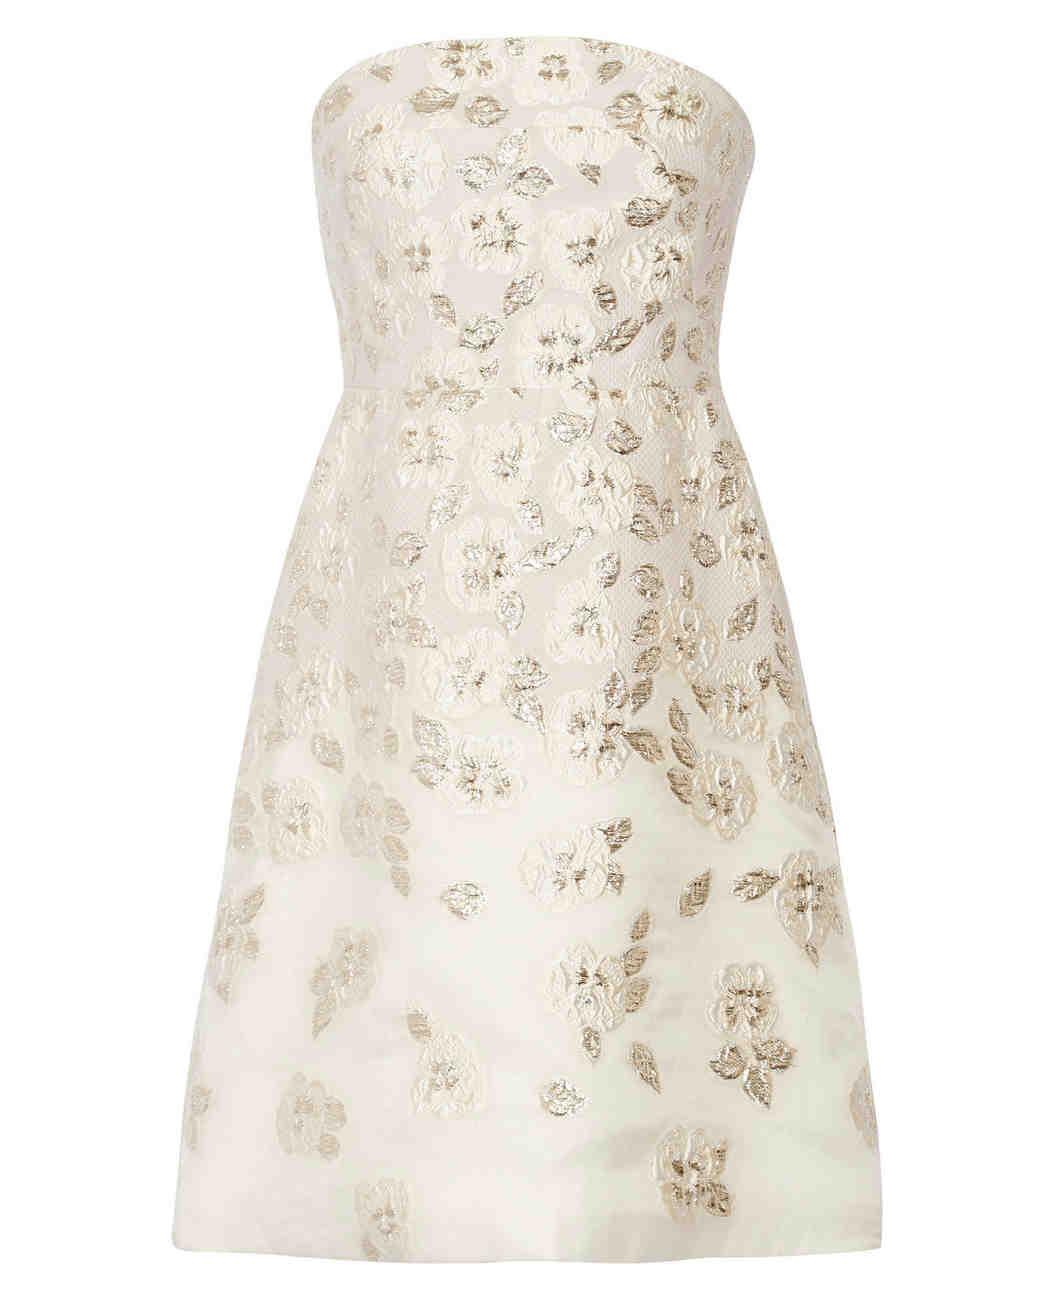 engagement-party-dresses-lela-rose-1215.jpg